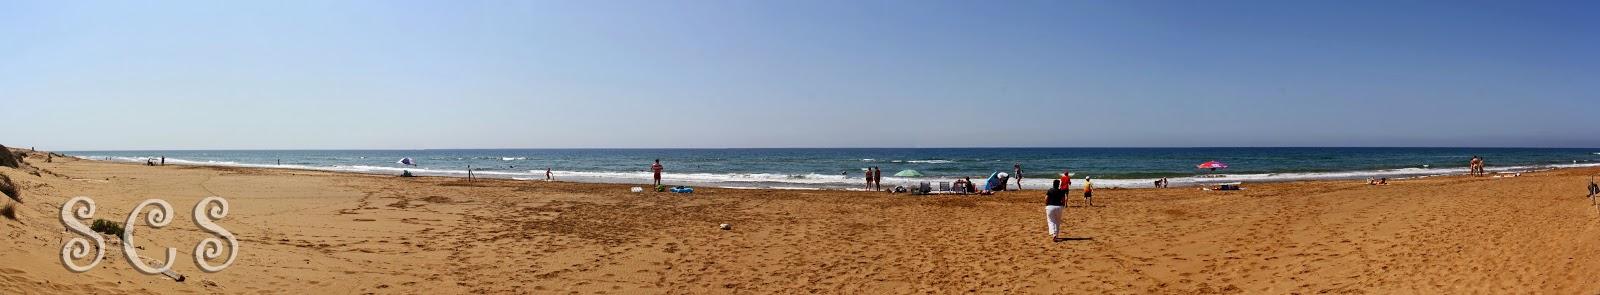 Playa Larga en Calblanque (Murcia)